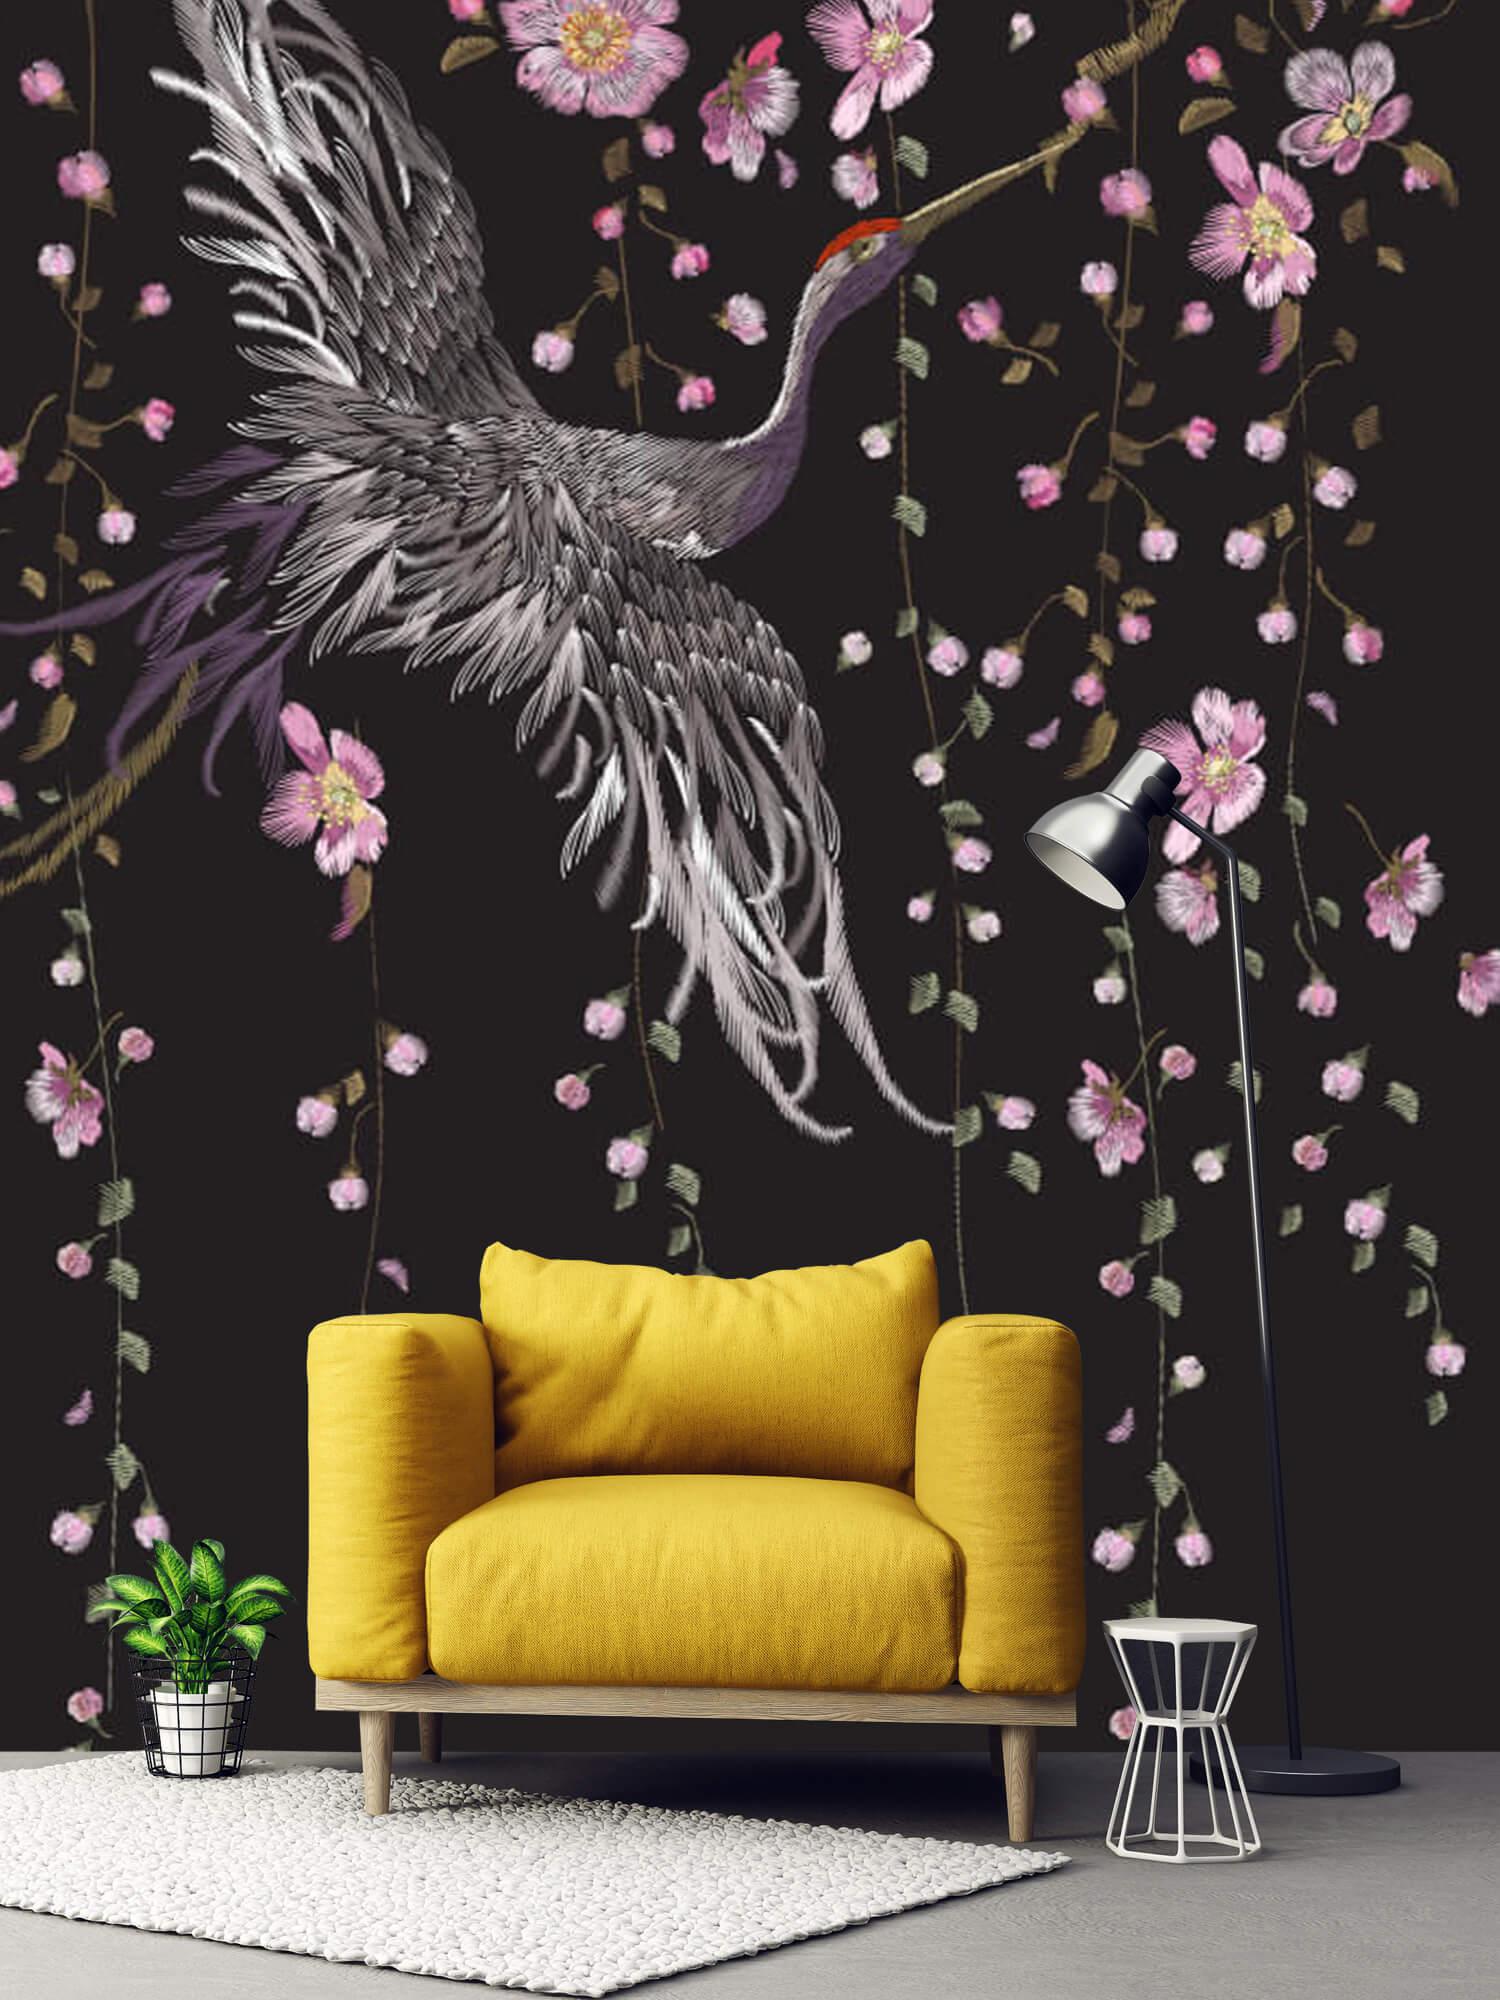 pattern Kraanvogel bij roze bloemen 5